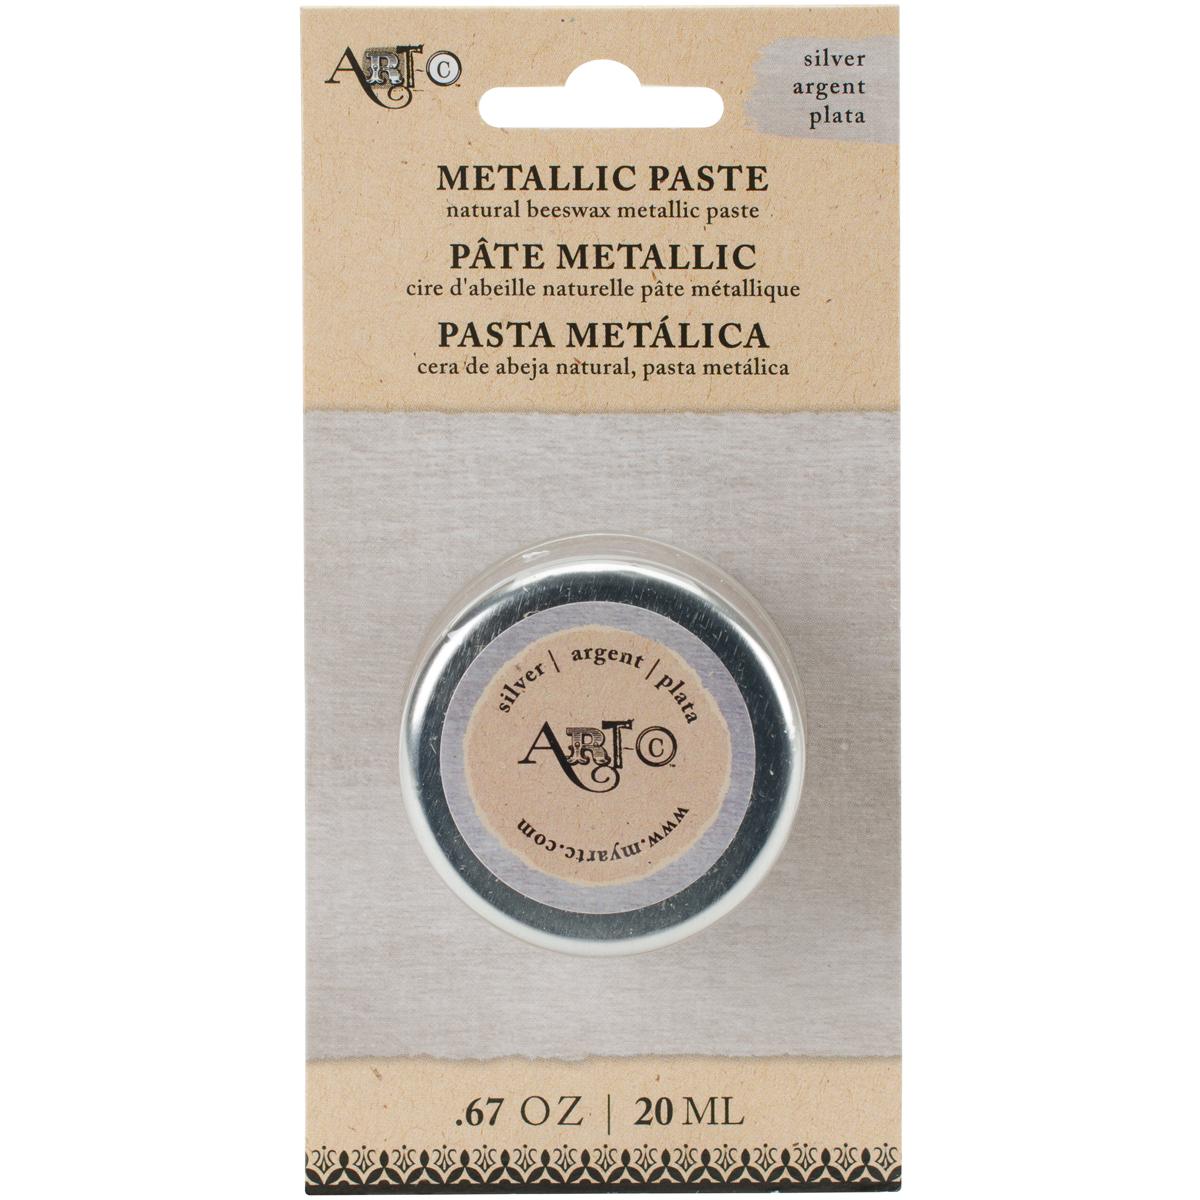 Artcwax - 25970 Silver    -Artc Wax Paste 20Ml